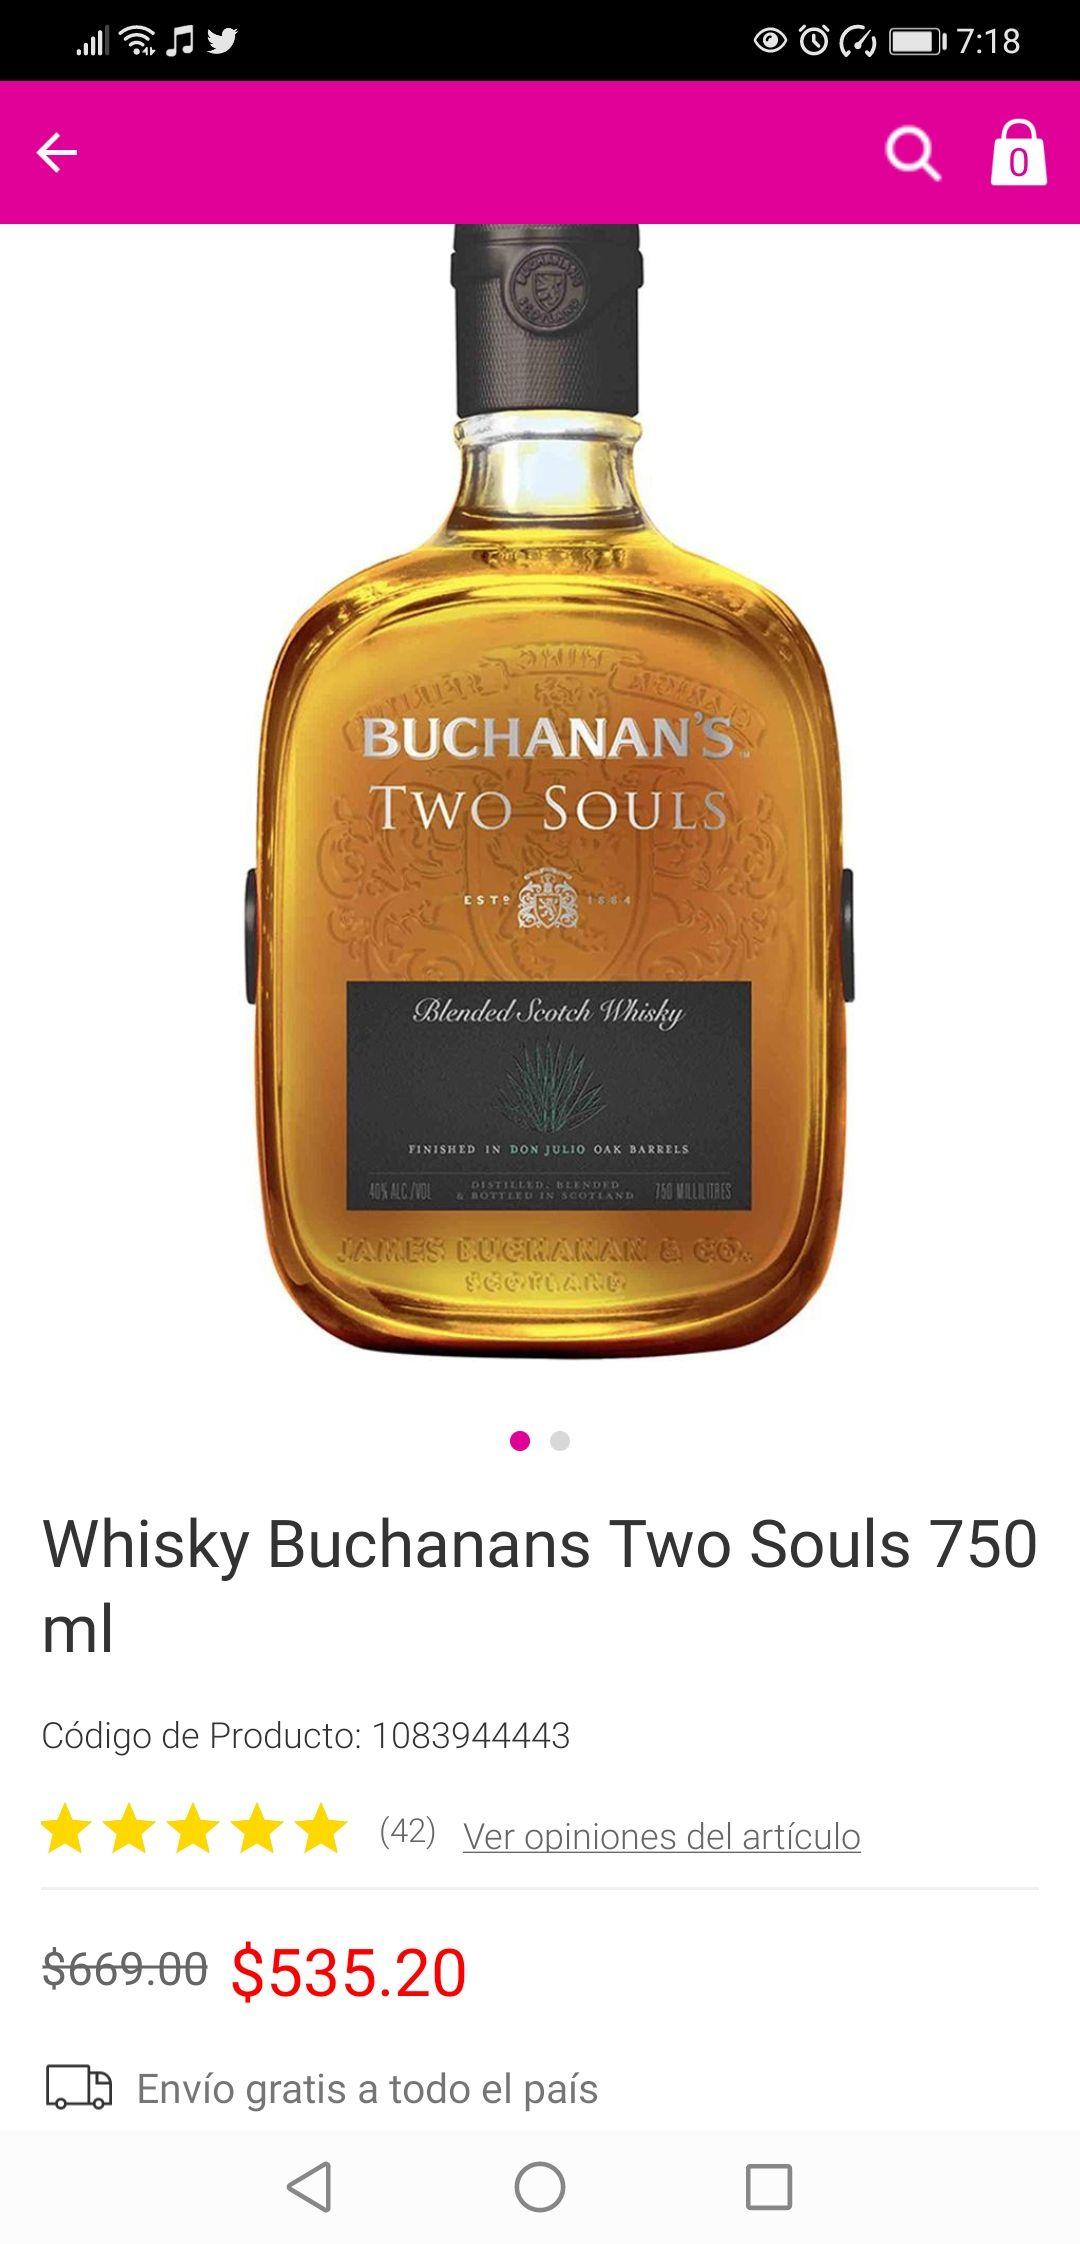 Liverpool: Buchanan's Two Souls